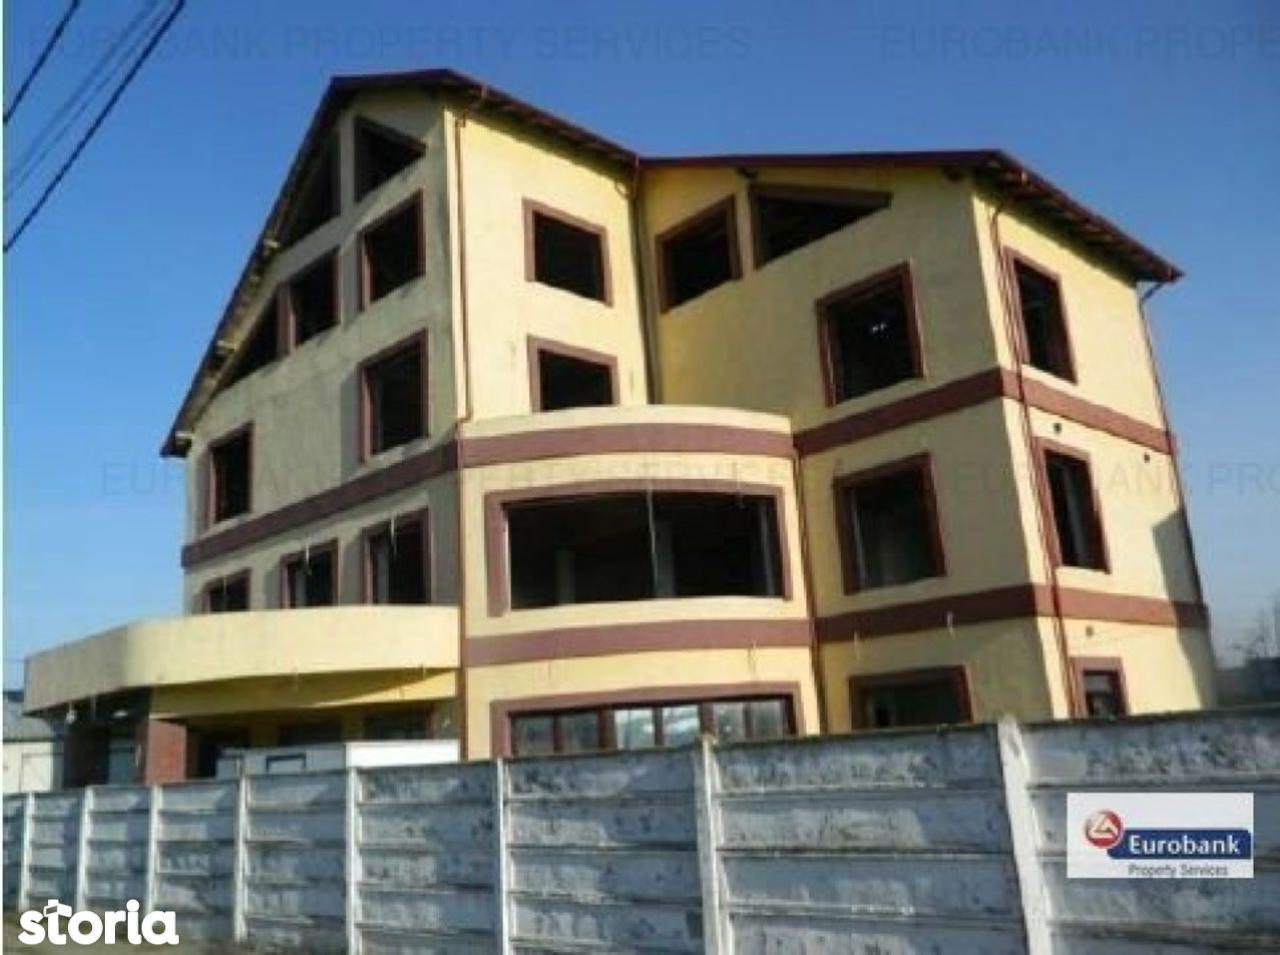 Casa de vanzare, Vrancea (judet), Strada Doinei - Foto 1